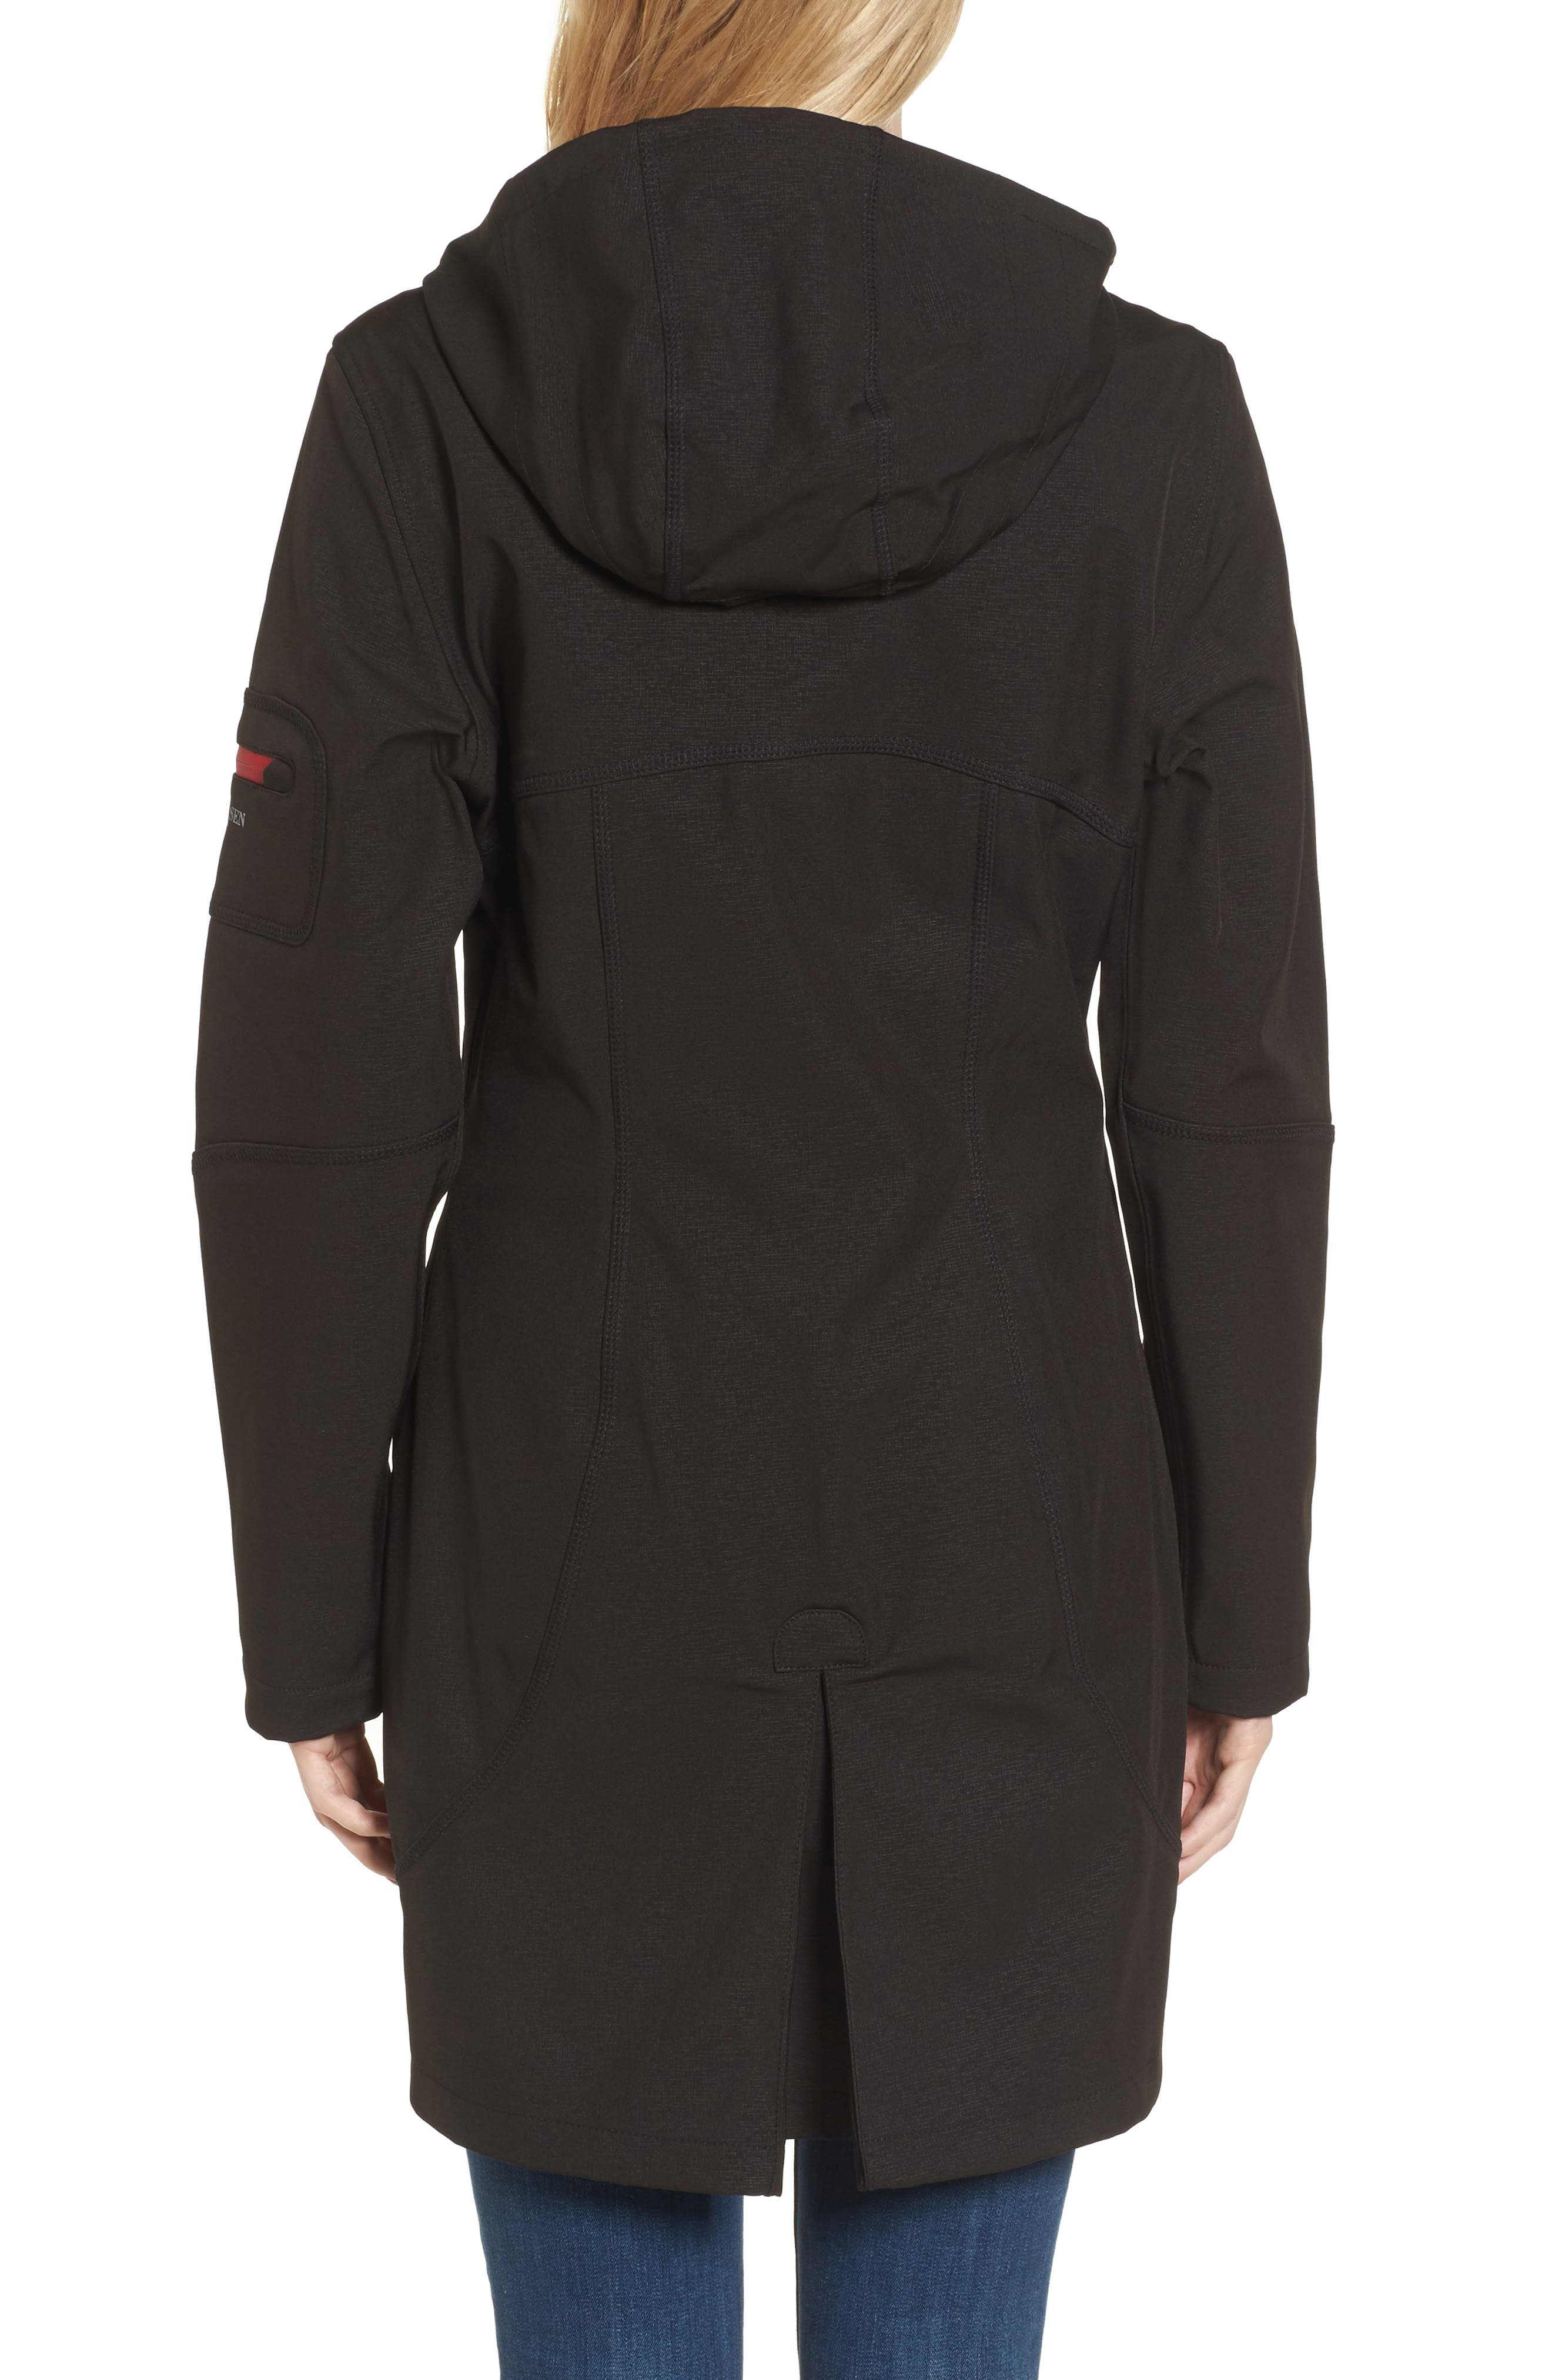 'Rain 7B' Hooded Water Resistant Coat,                             Alternate thumbnail 3, color,                             Black/ Wine